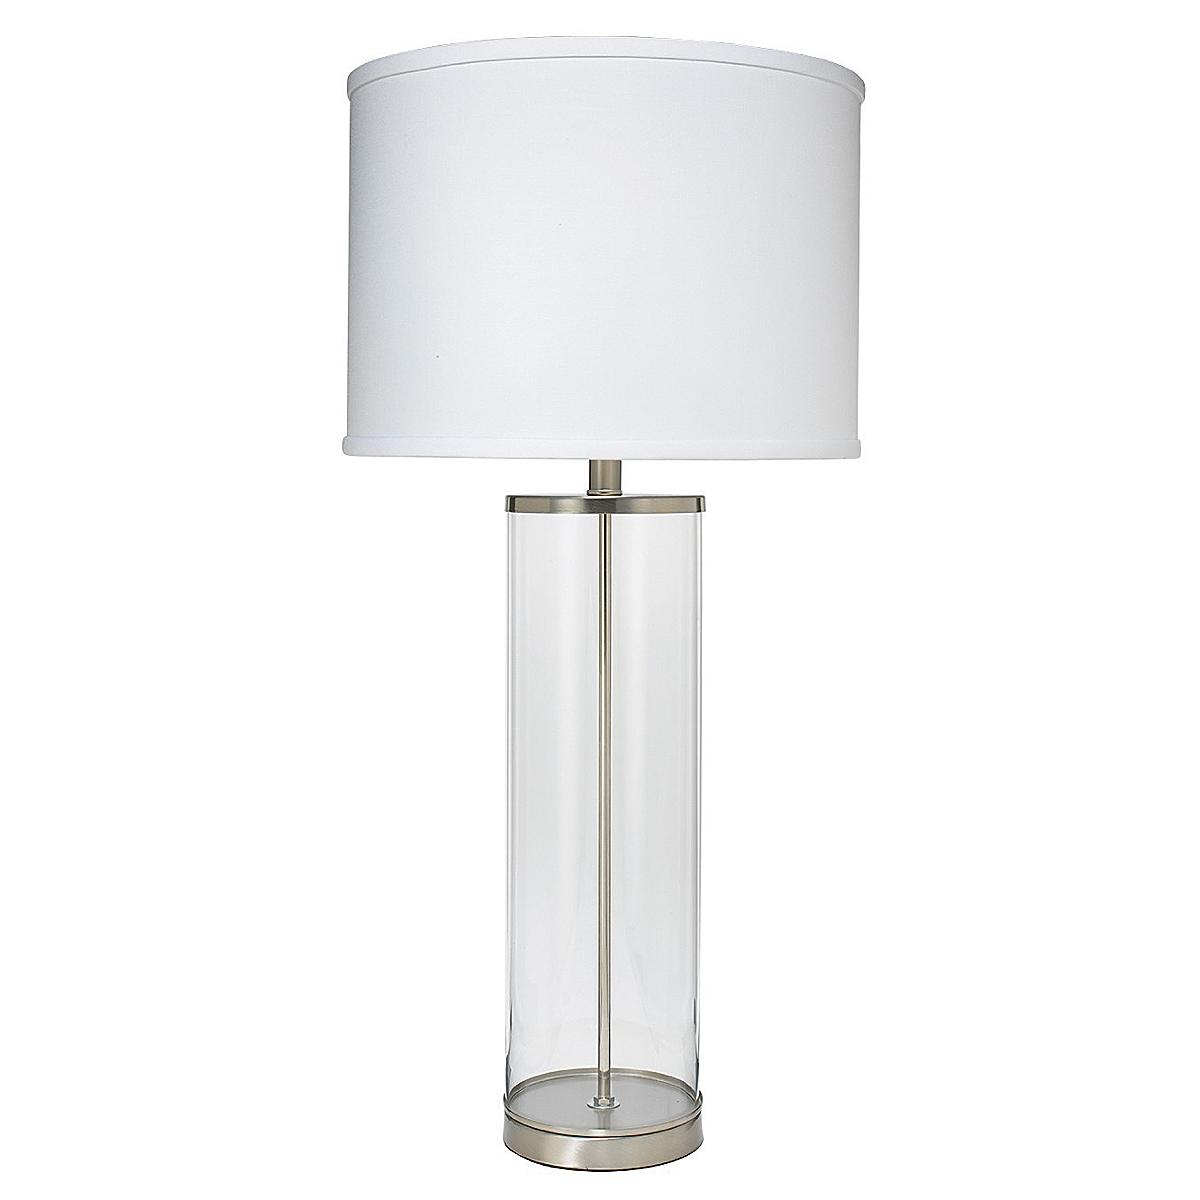 Rockefeller Lamp - Nickel